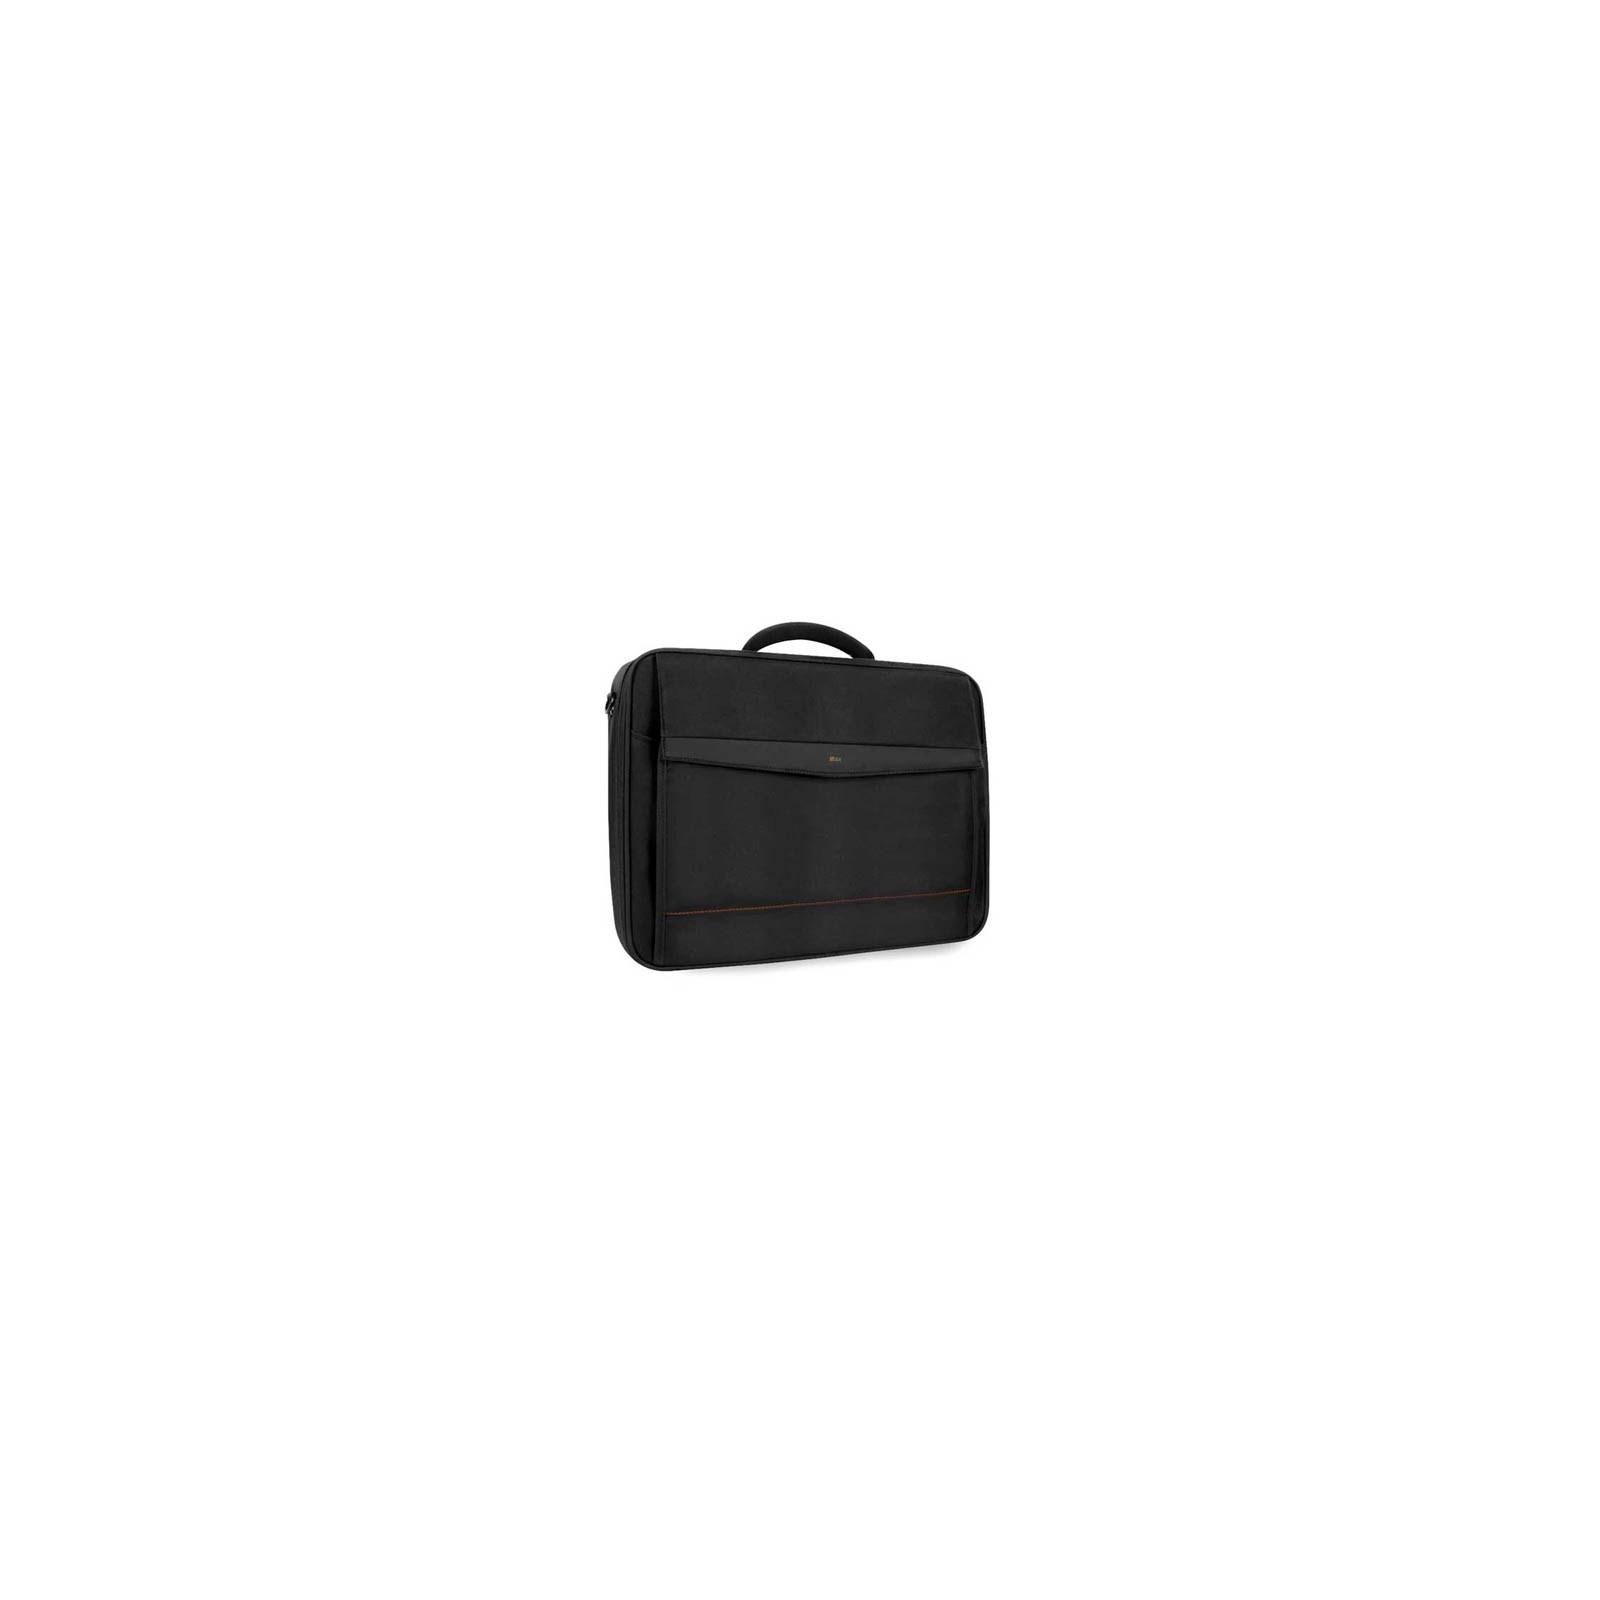 "Сумка для ноутбука Lex 17"" (LX105PF-BK/LX105P17-BK)"